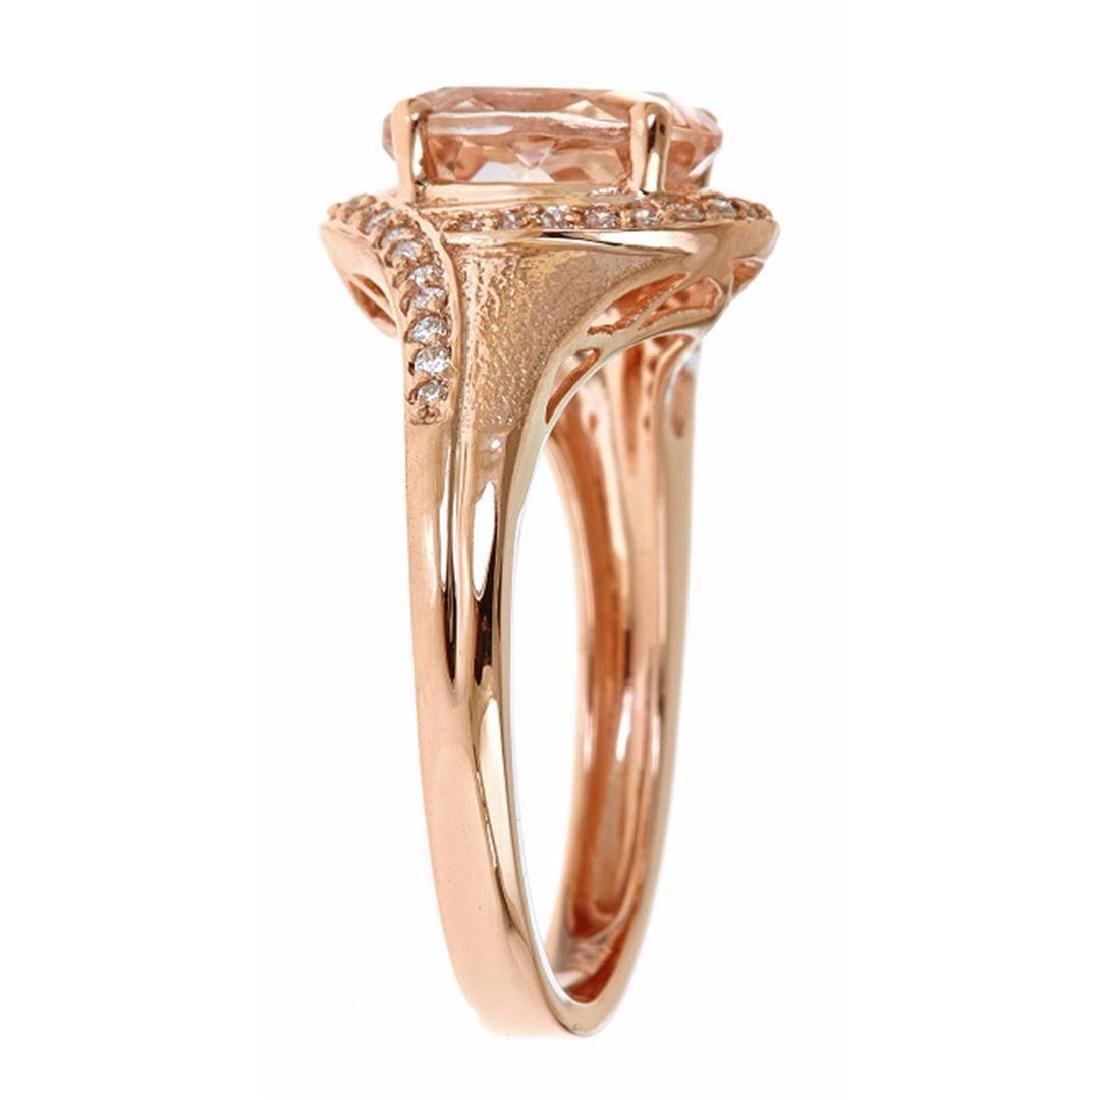 1.54 ctw Morganite and Diamond Ring - 10KT Rose Gold - 2